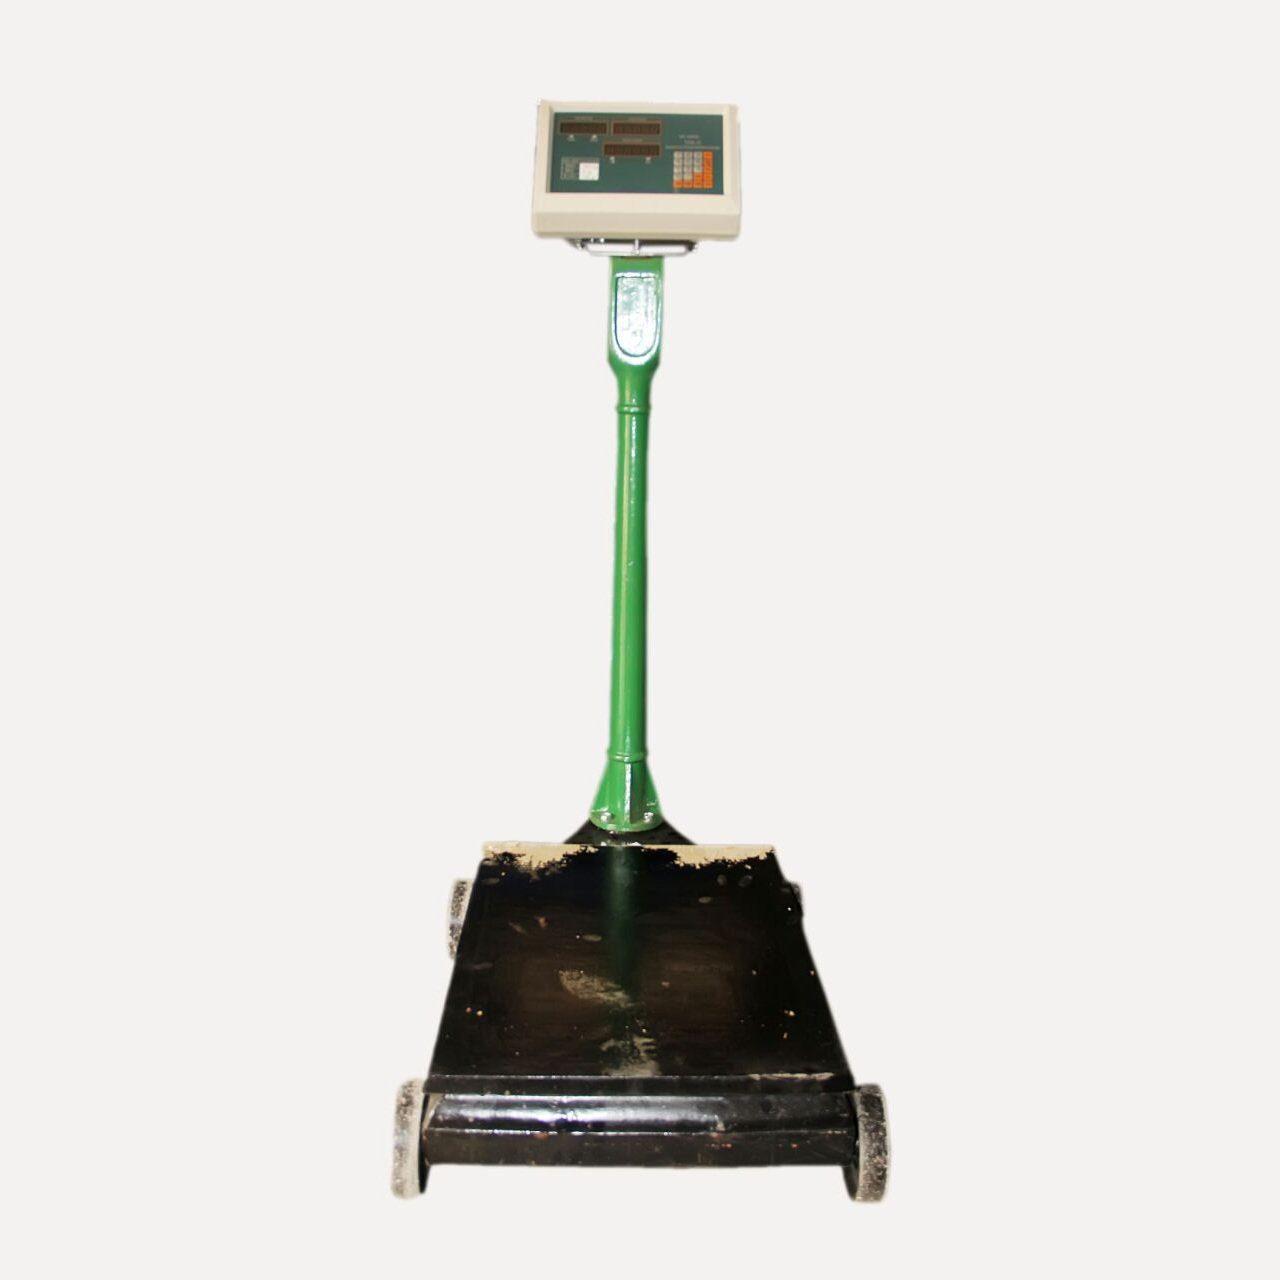 Digital Weighing Scale 1 ton